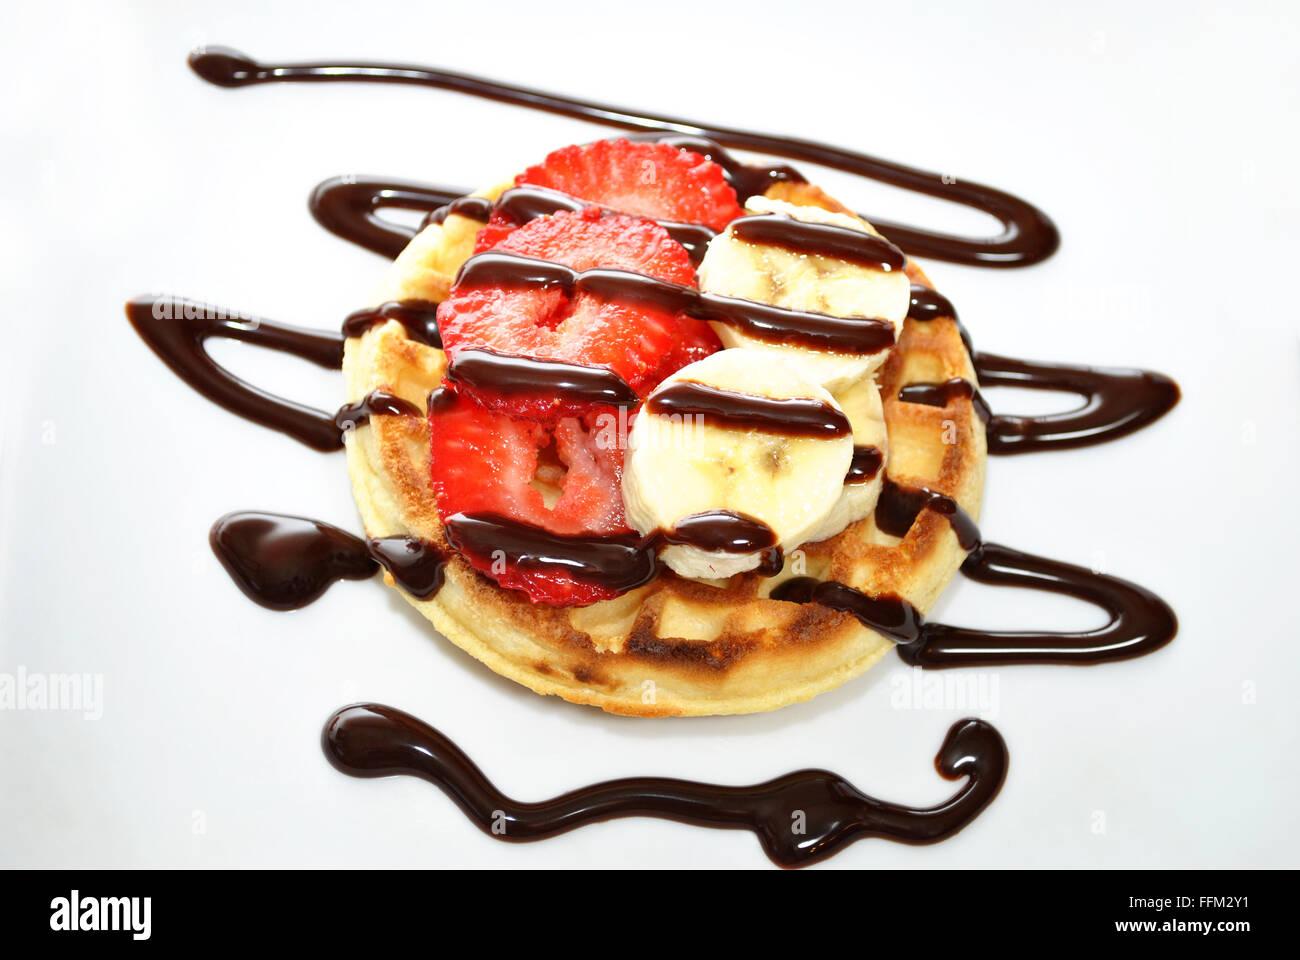 Gourmet Waffle Dessert with Fruit & Chocolate Sryup - Stock Image